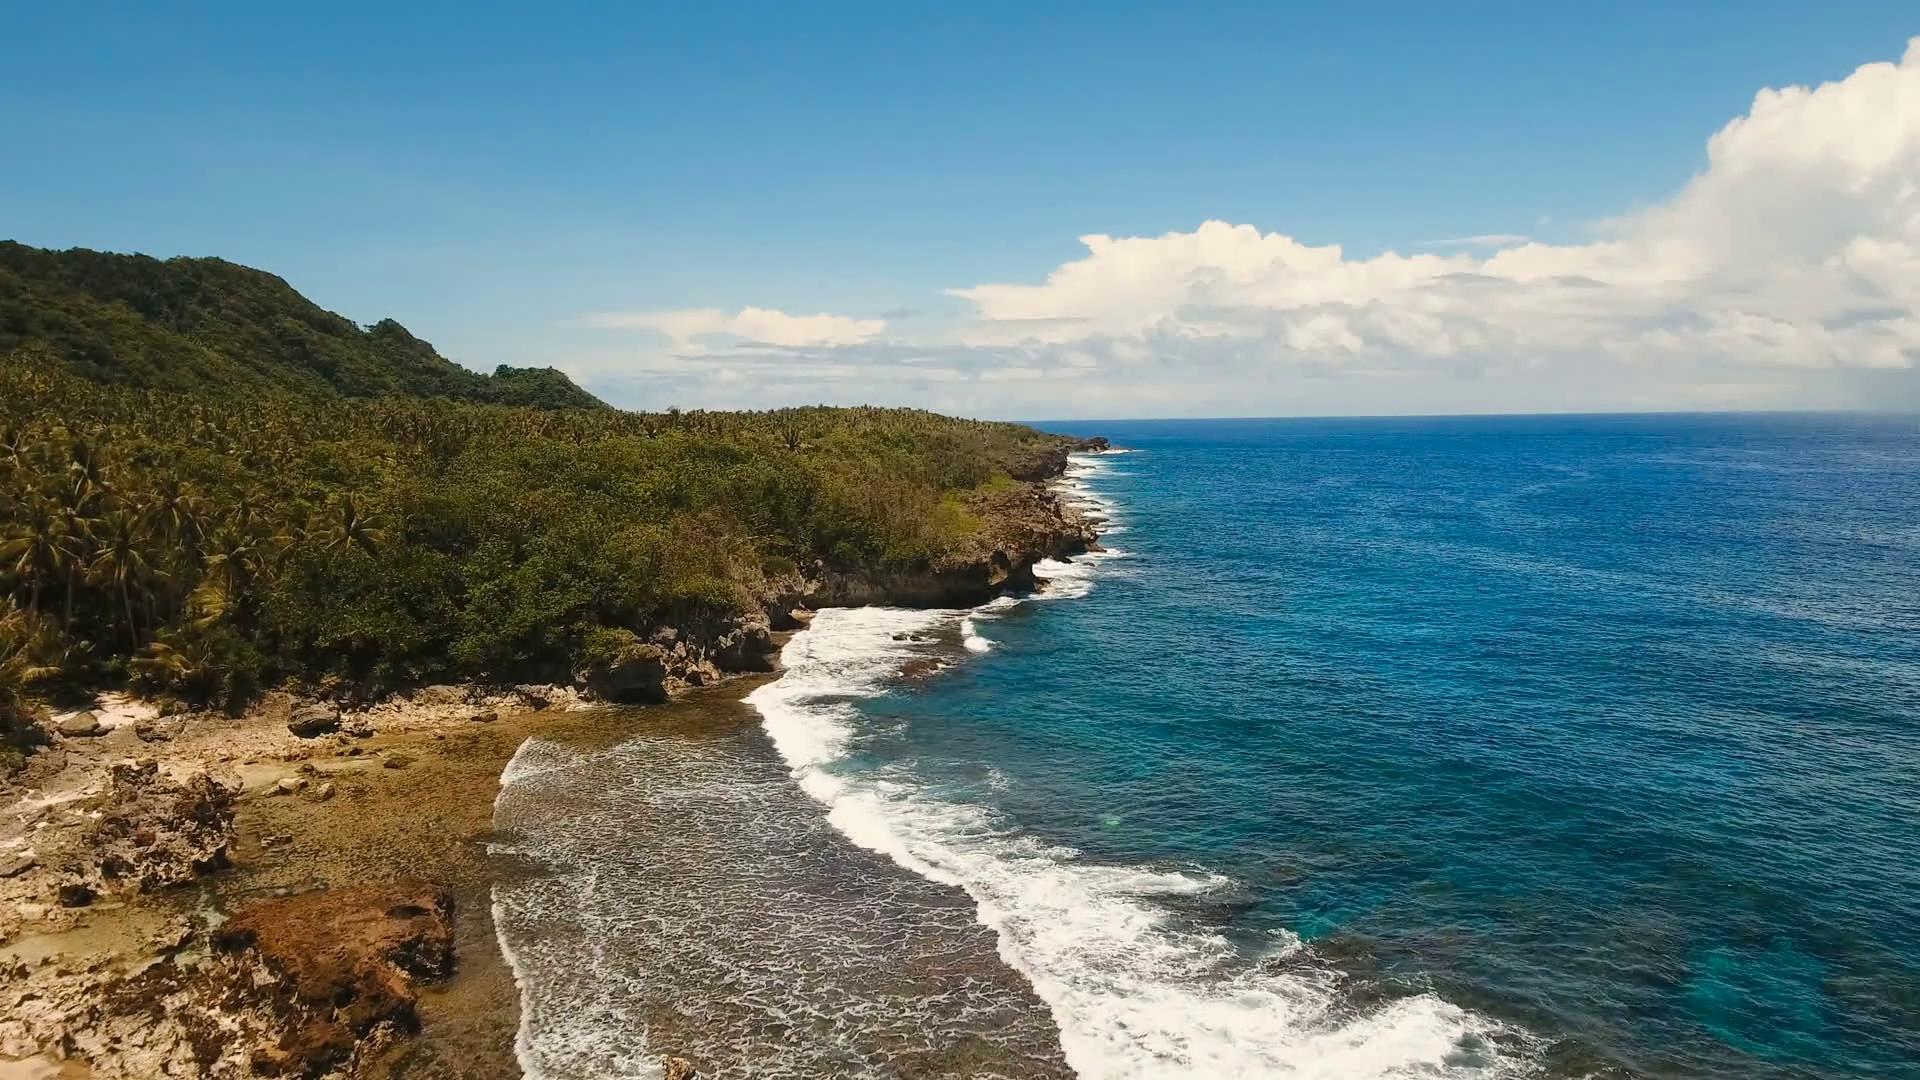 Rocky coast line of Island Siargao. Aerial view sea rocky coast ...